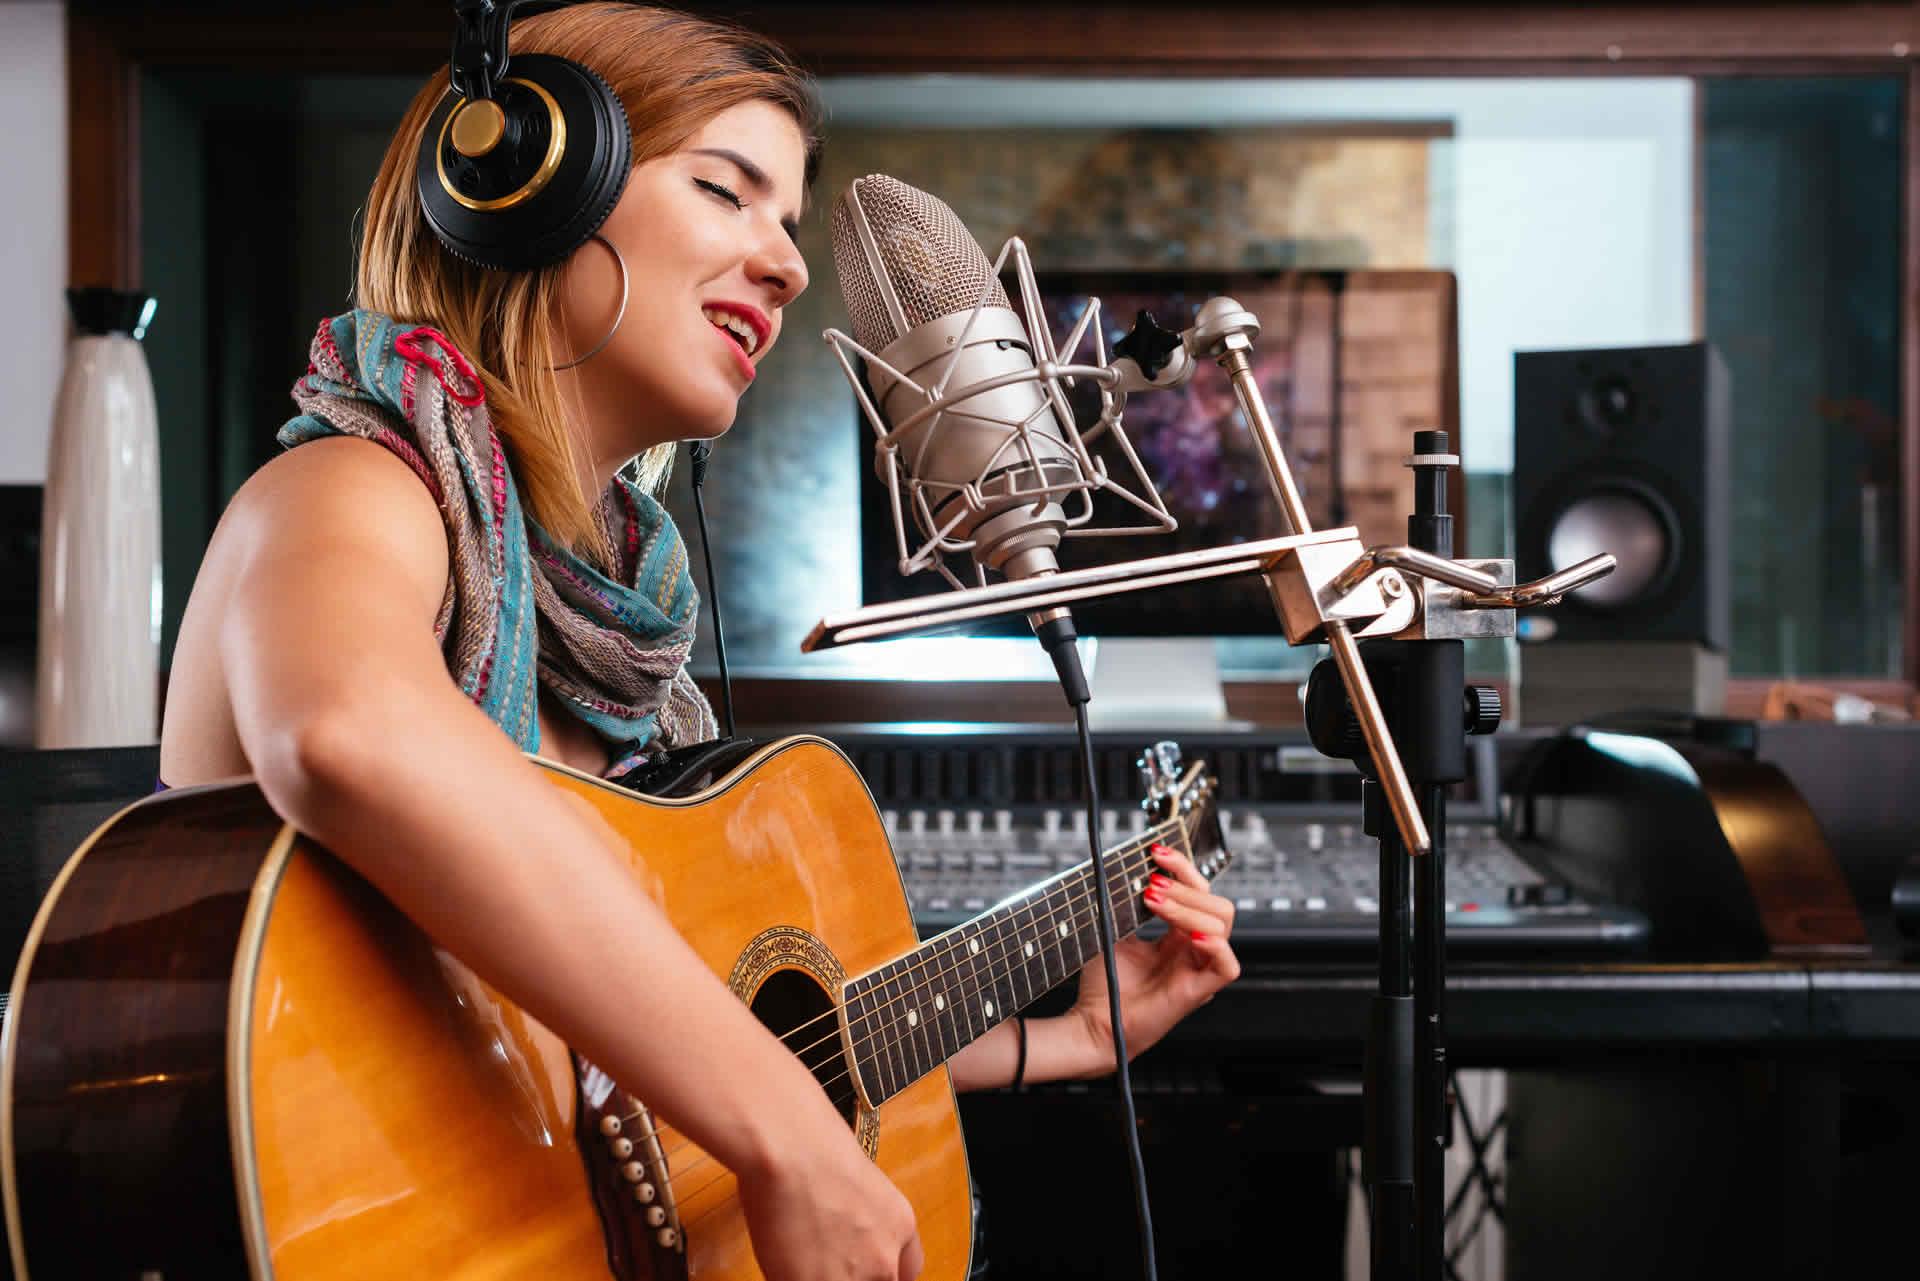 Musician Recording Studio Experience